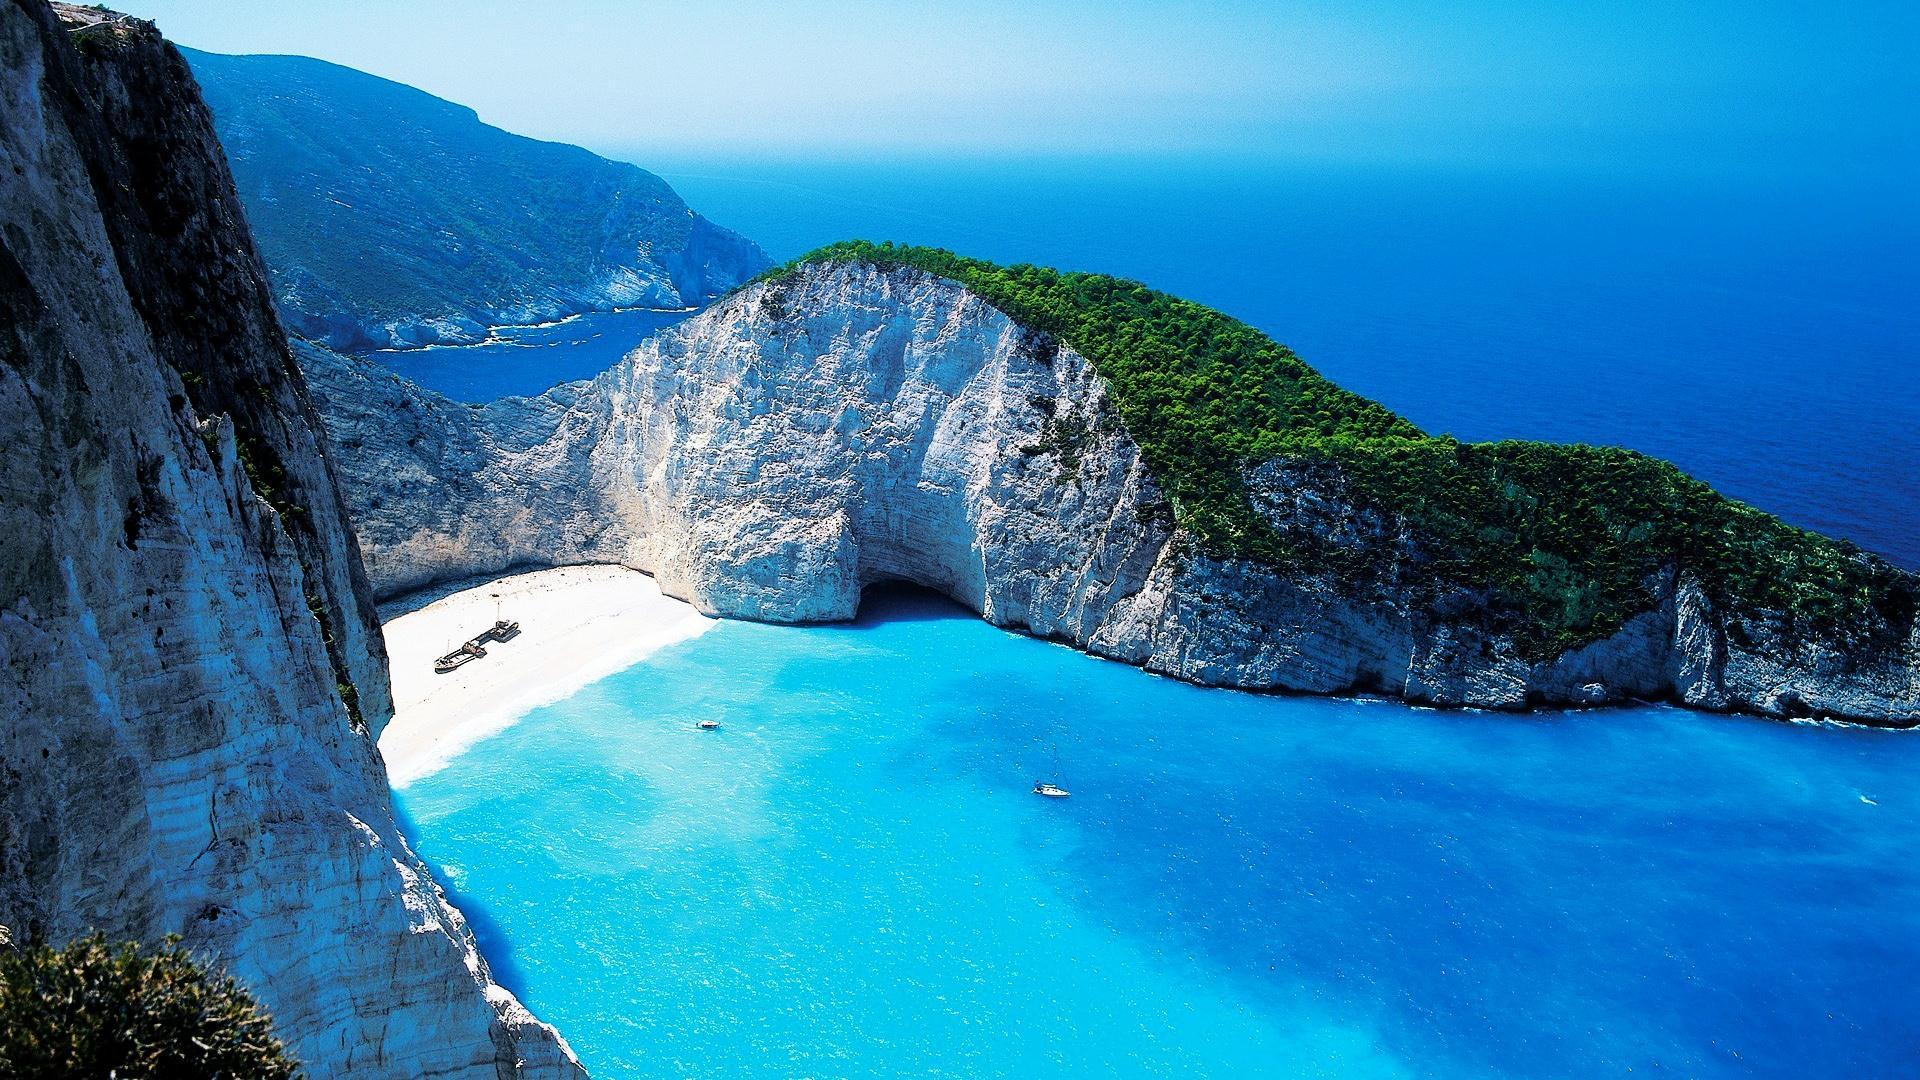 Navagio Shipwreck Beach Smugglers Cove Zakynthos Greece Desktop 1920x1080